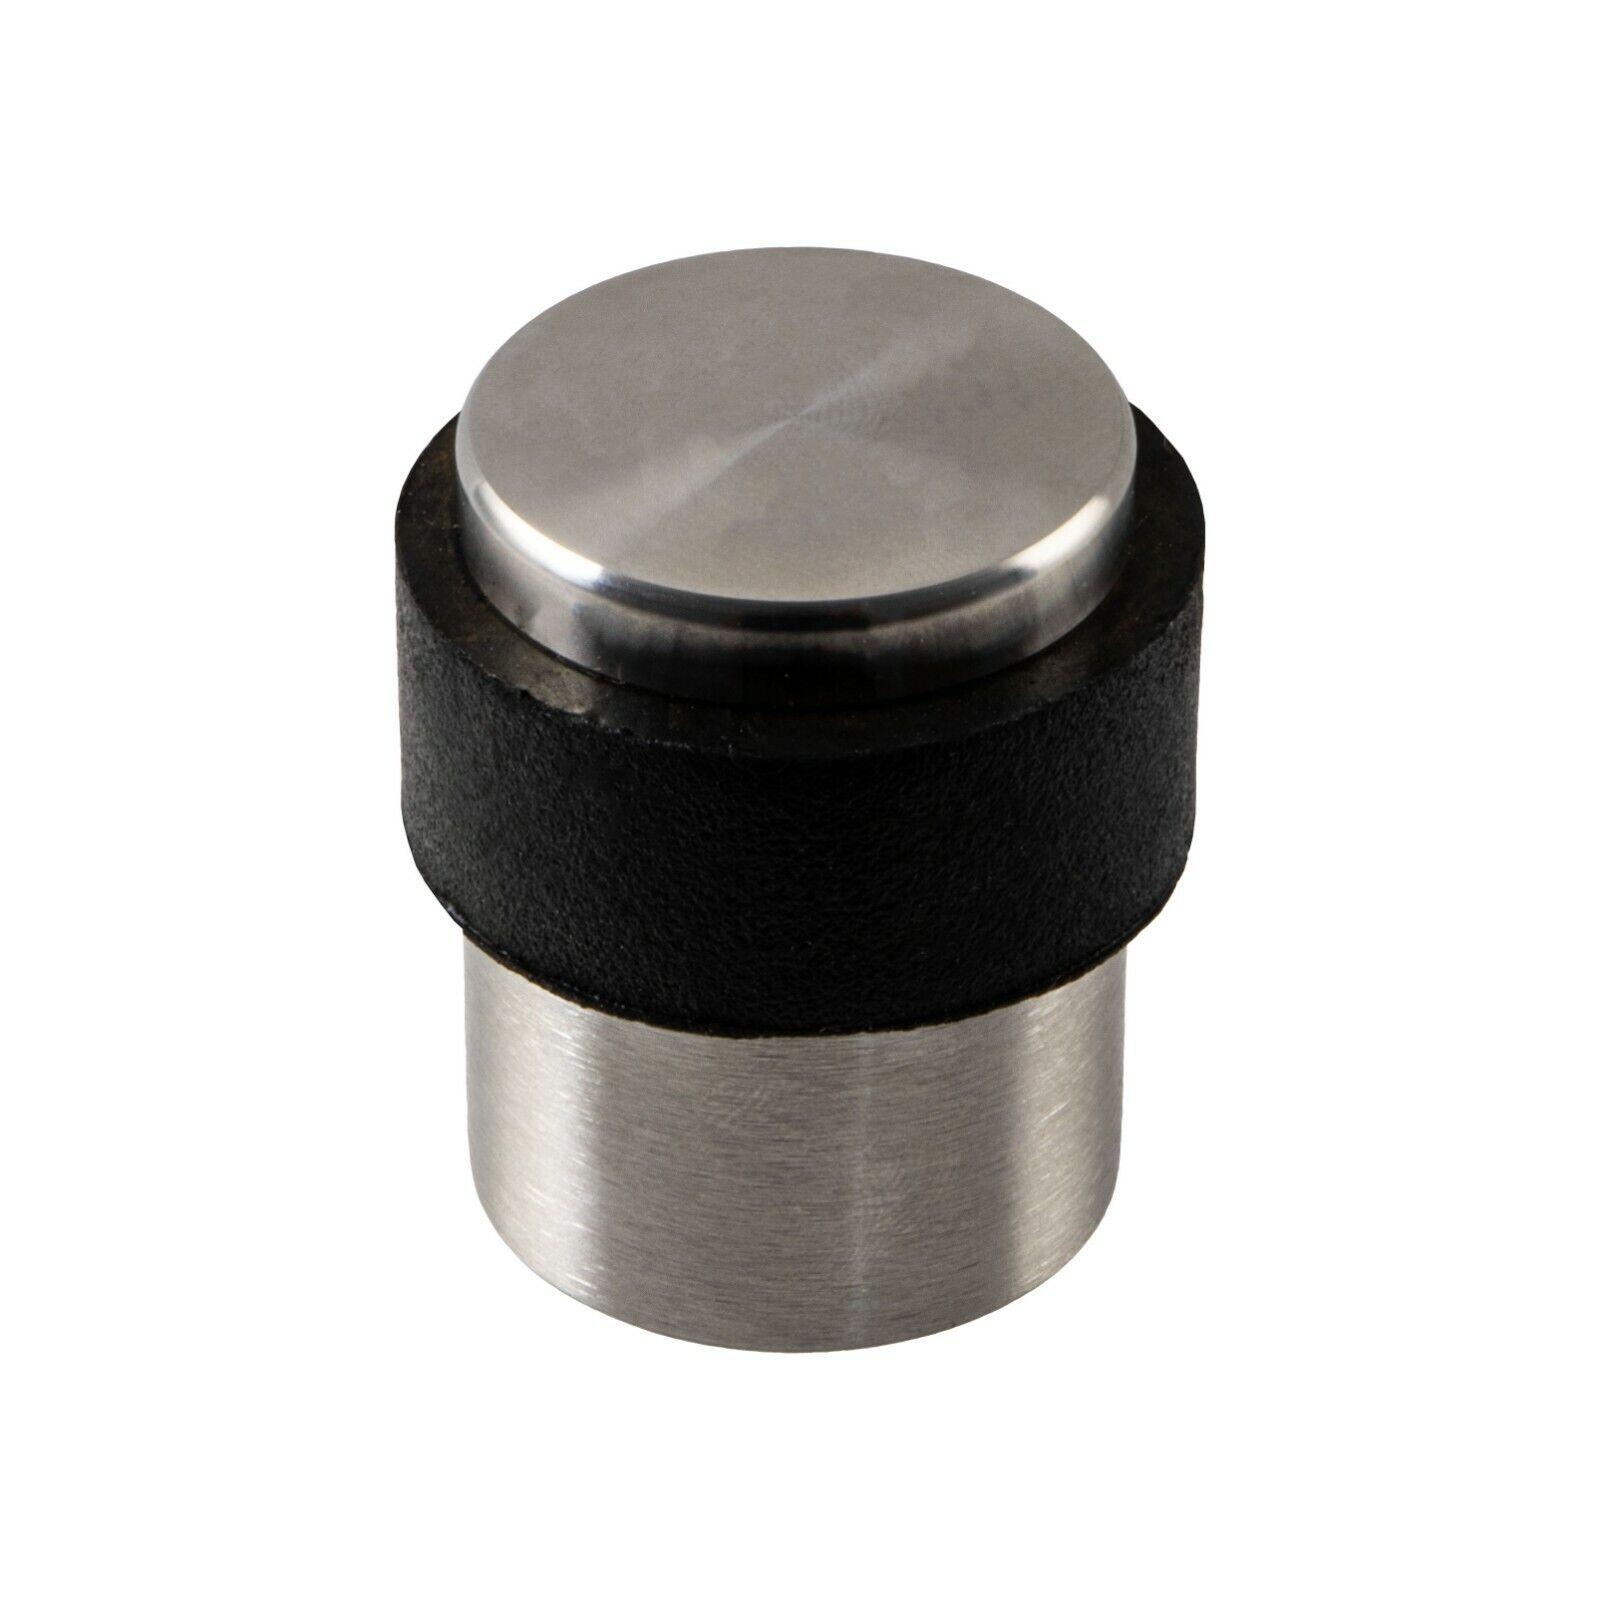 Türstopper Boden Türpuffer Edelstahl Gummipuffer Silber Kleben oder Schrauben